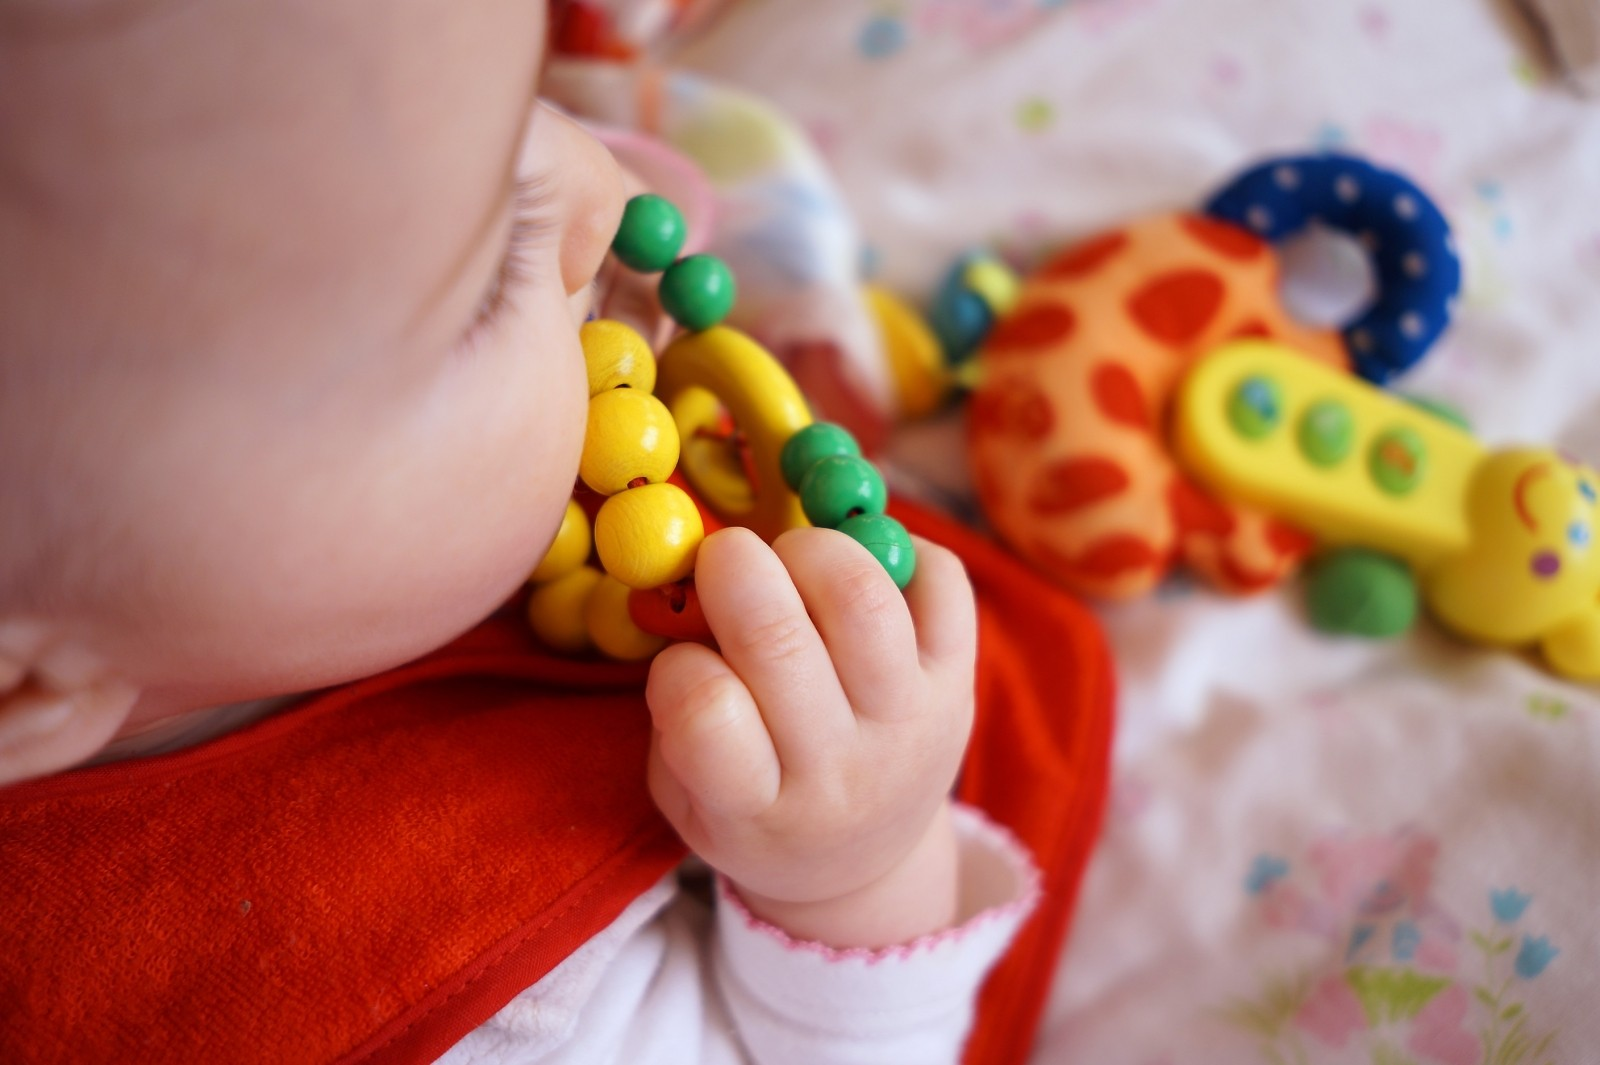 baby-hand-child-infant.jpg